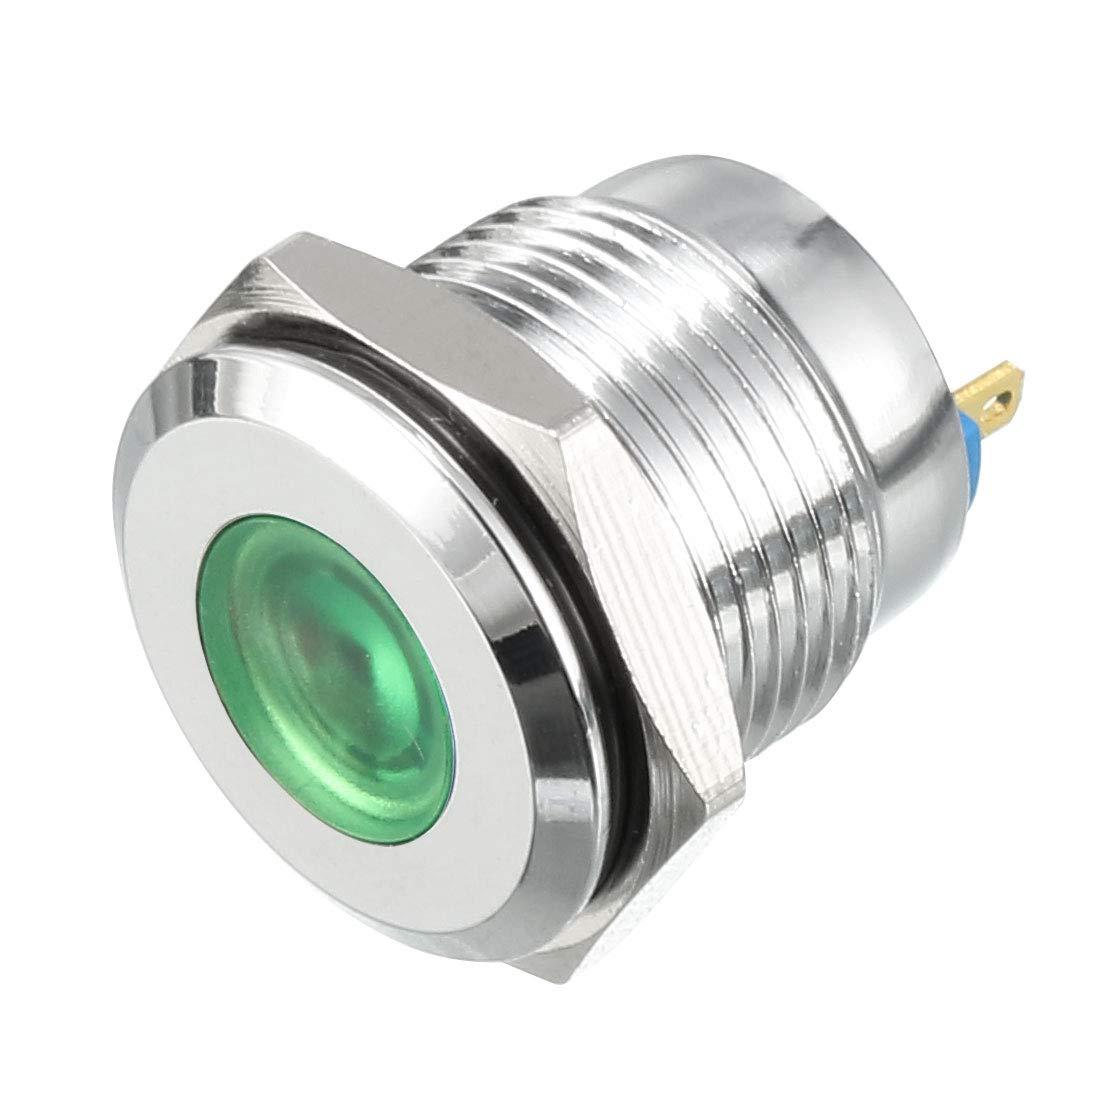 uxcell LED Indicator Light 12V 16mm Blue Pilot Custom Dash Signal Lamp Concave Head